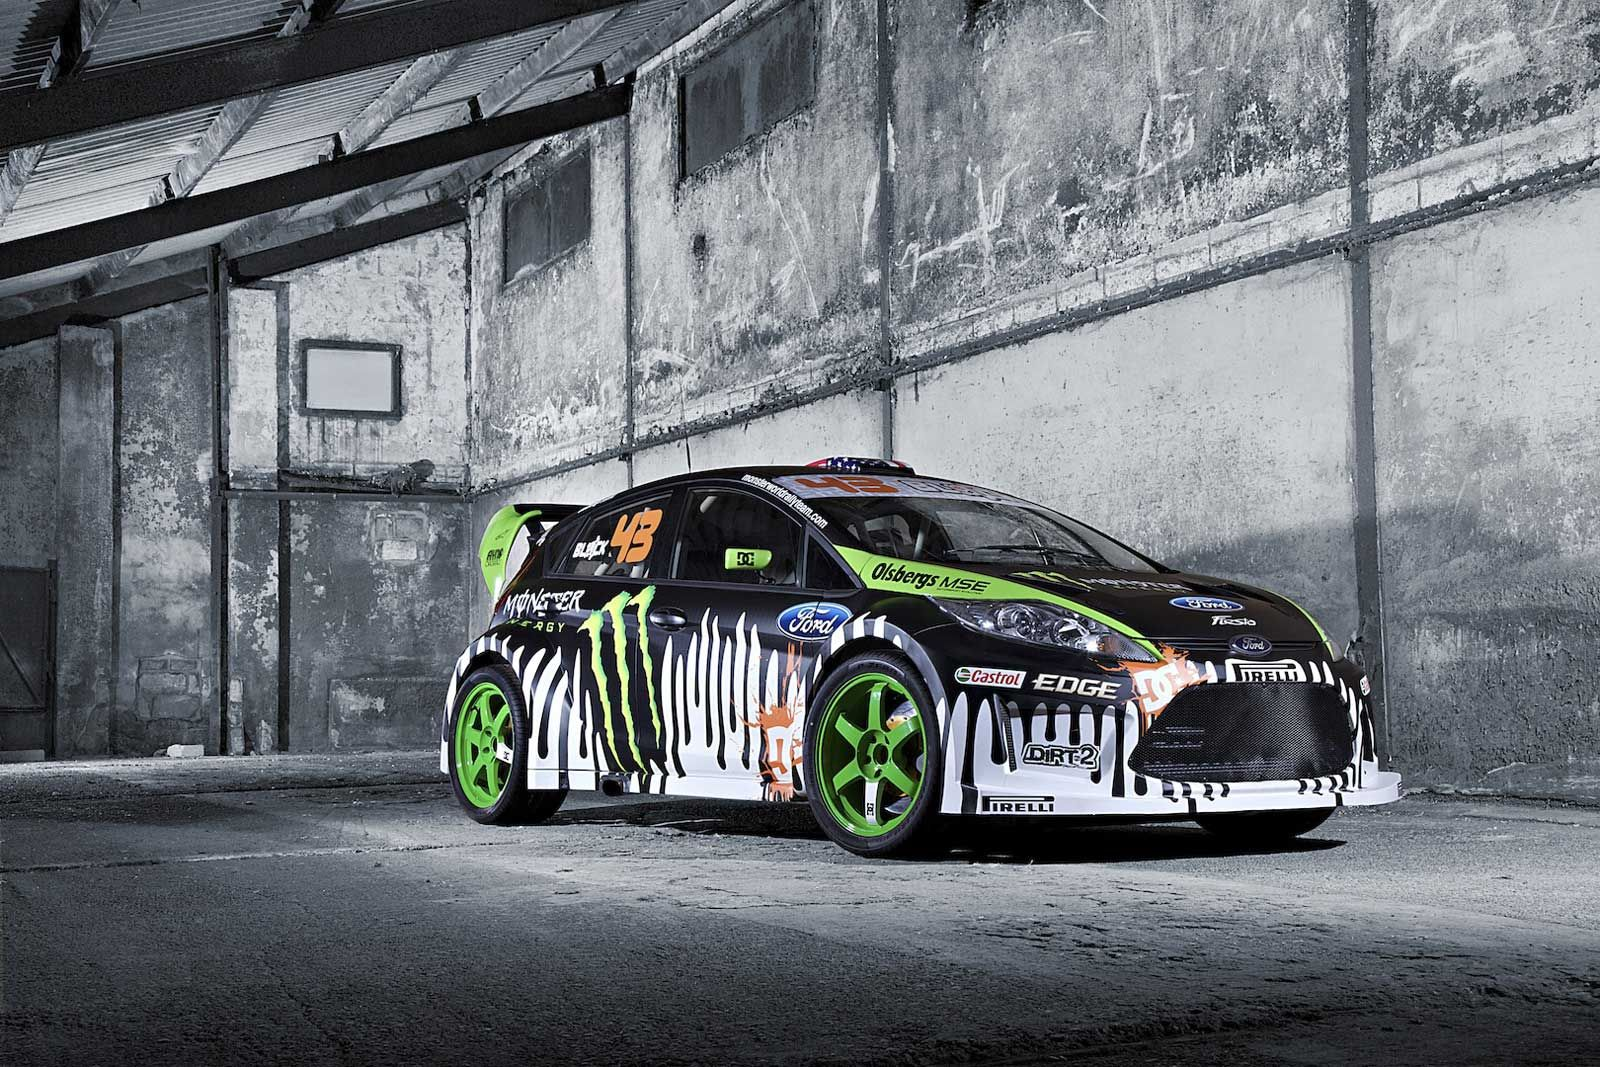 Ken Block S Ford Fiesta Rally Car Monster Car Wrap Vehikel